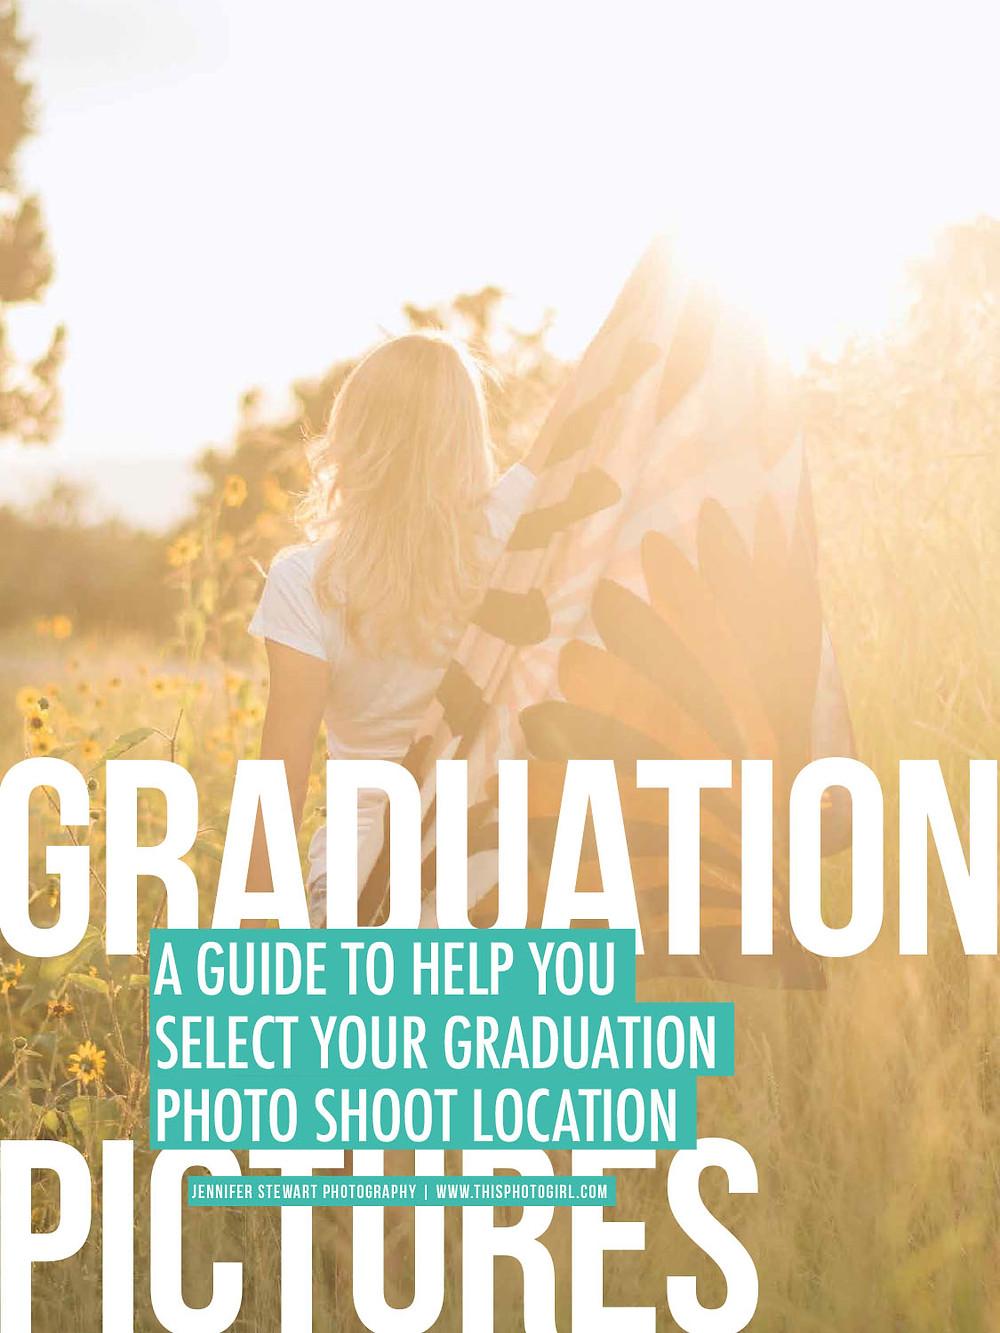 Graduation Photo Shoot Location Guide